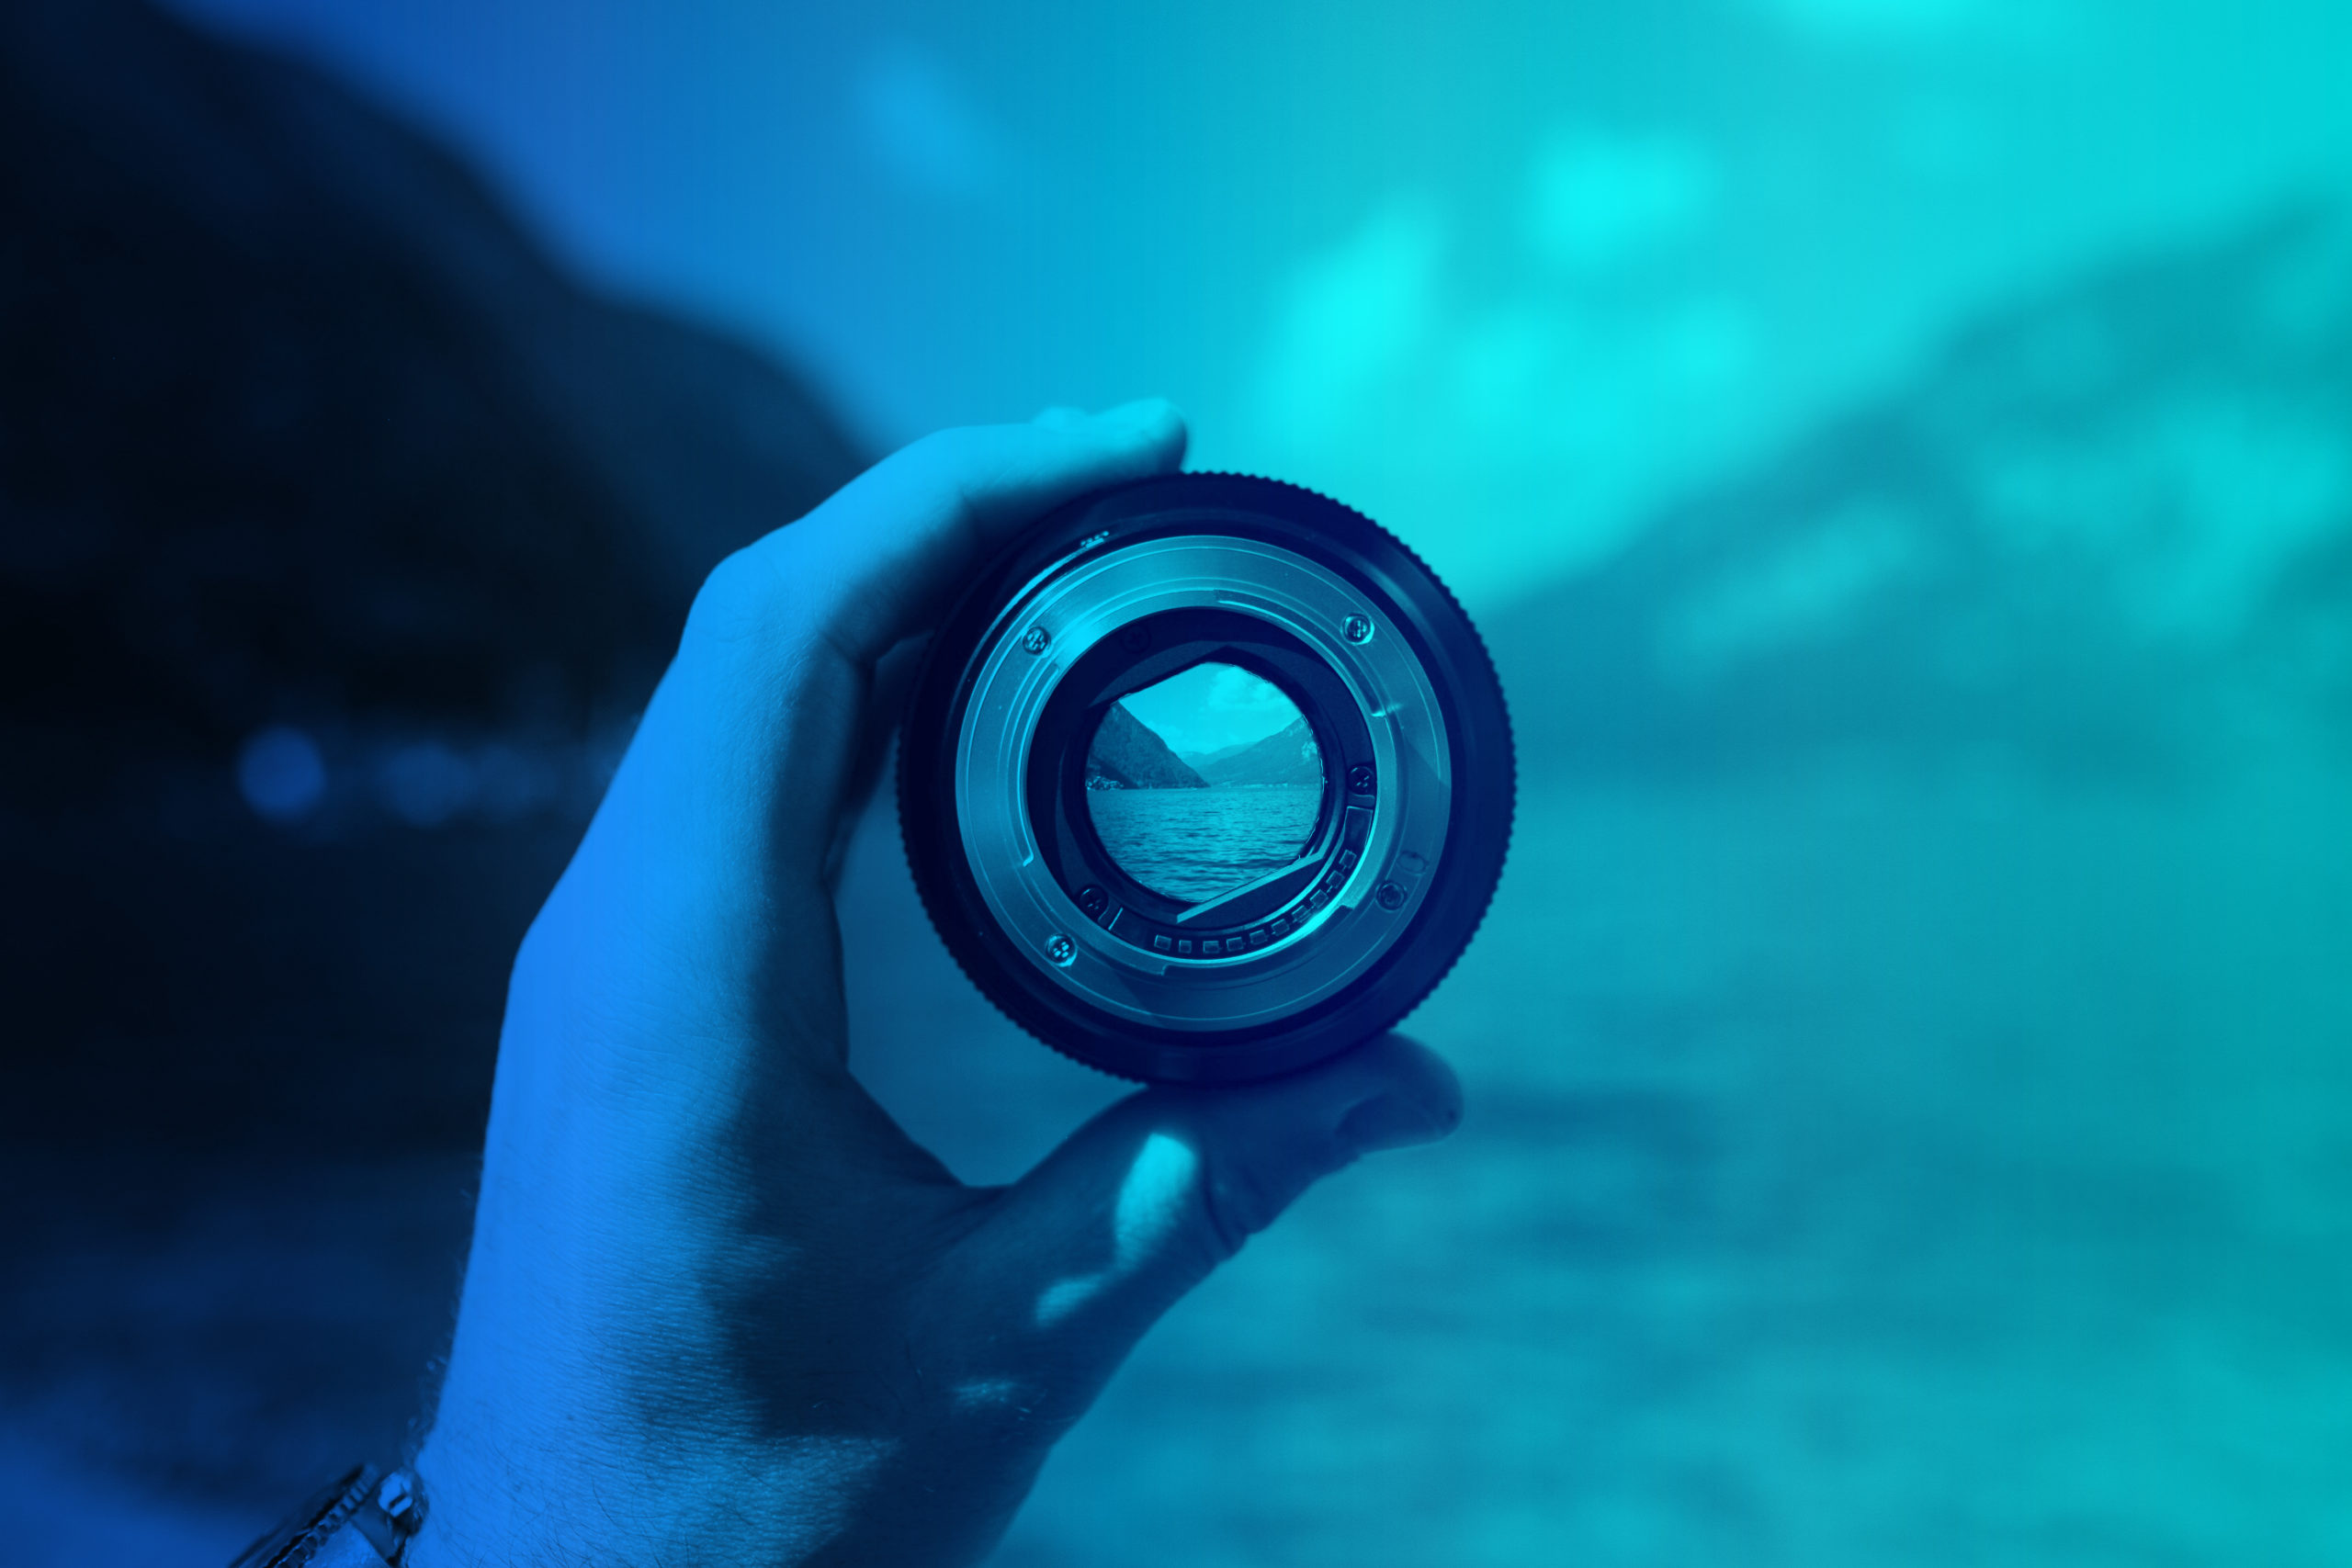 Focus through camera lens.